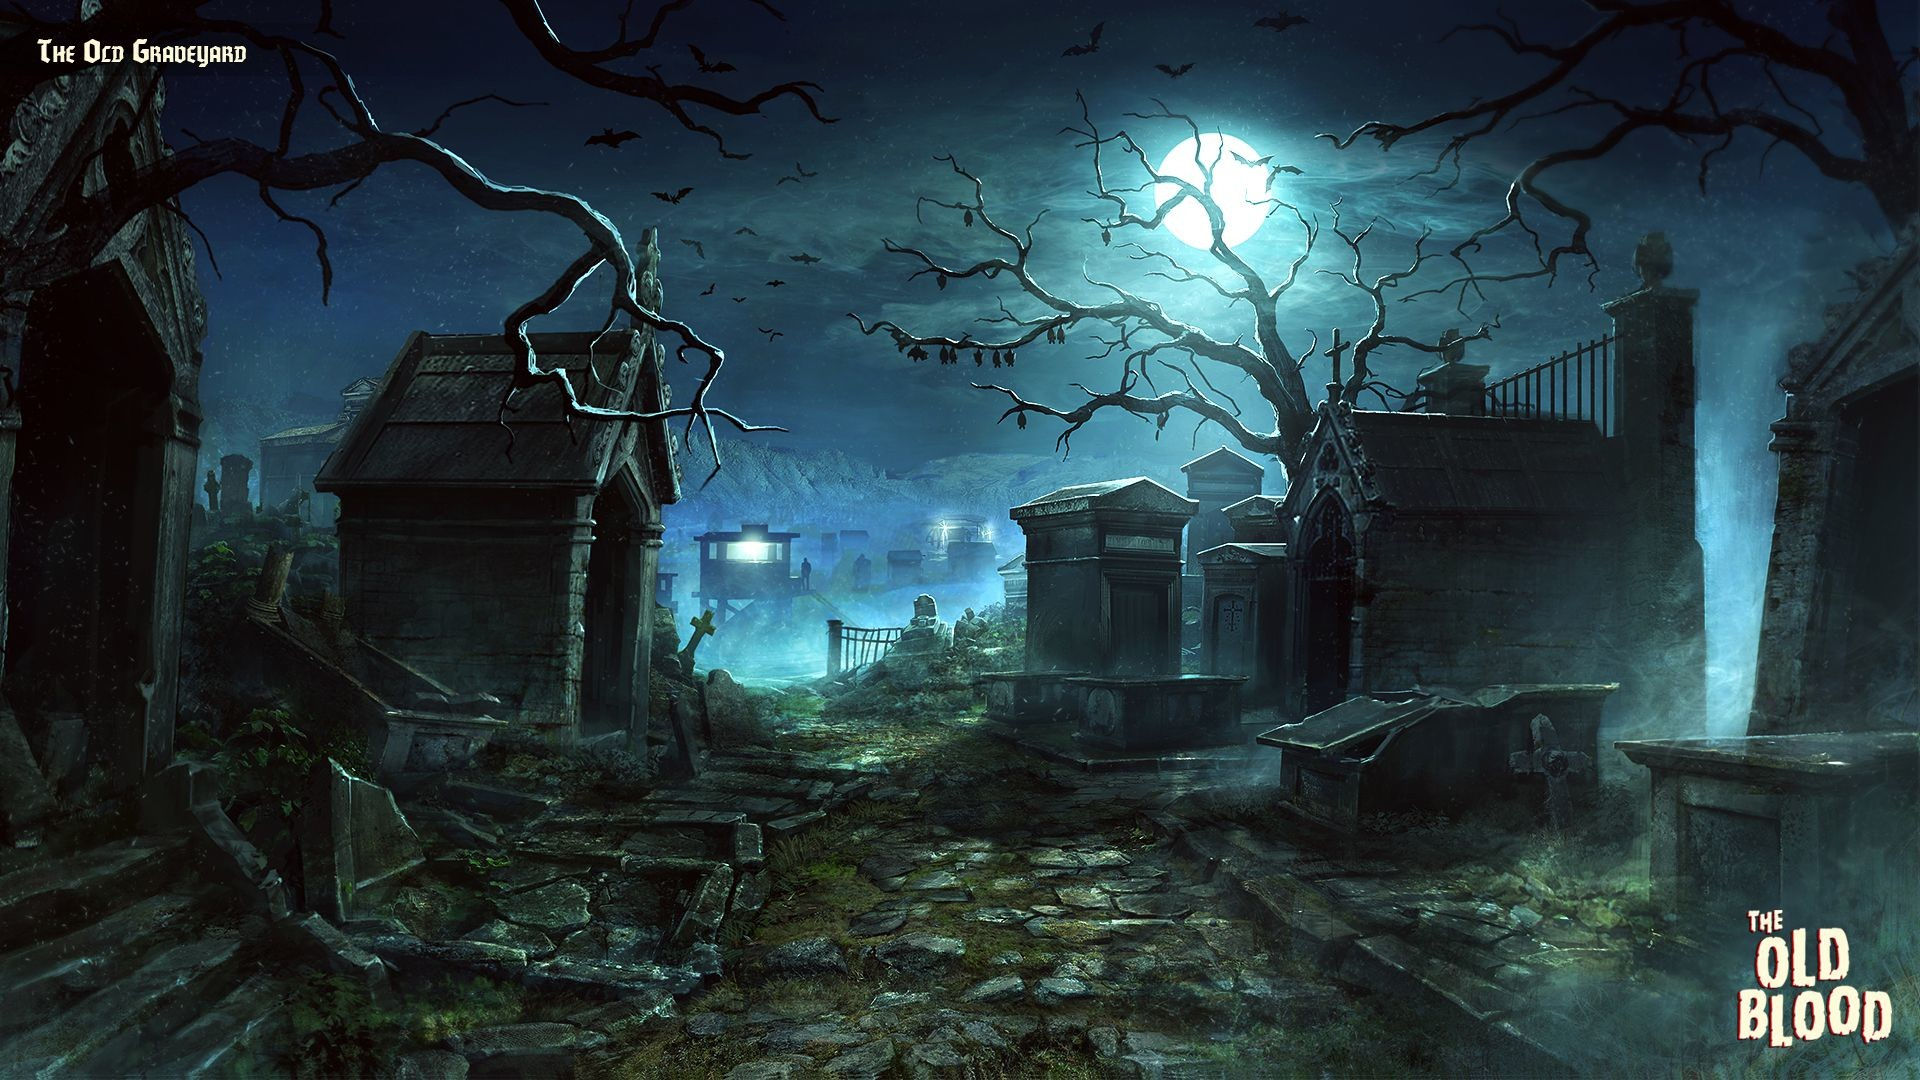 Gravity Falls Landscapes Wallpaper Graveyard Backgrounds 183 ①